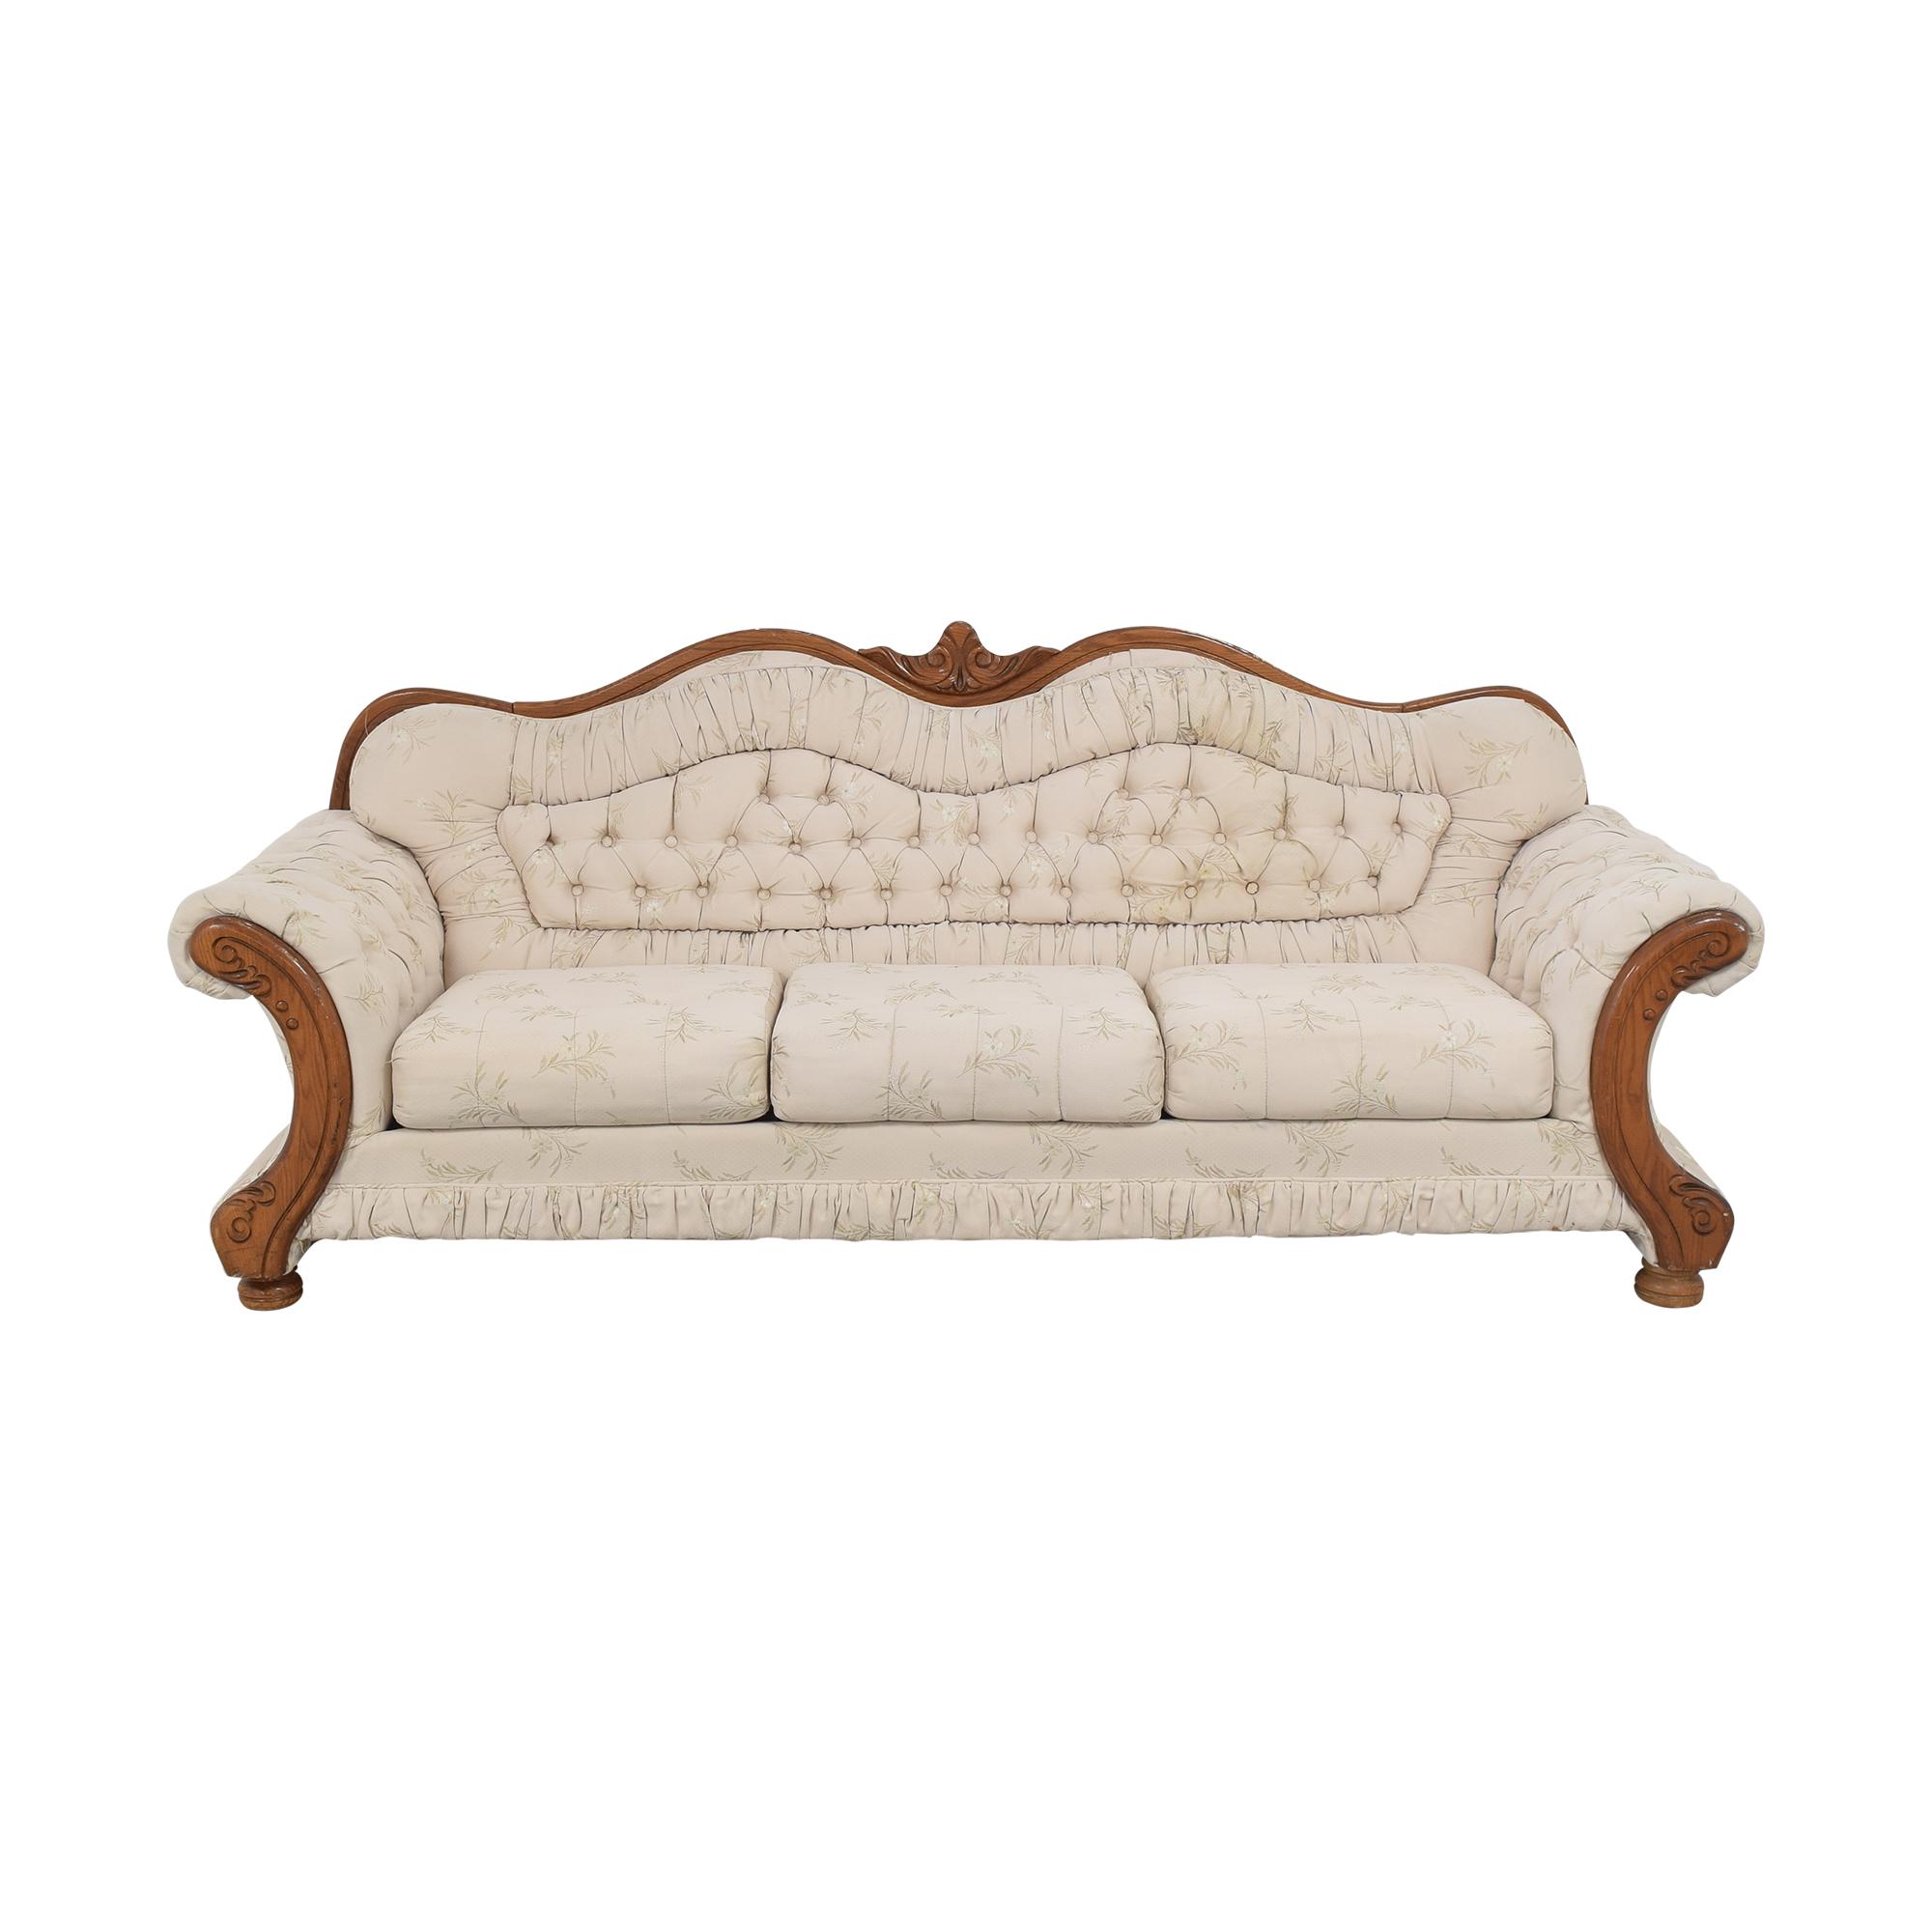 Campio Furniture French Provincial Sofa / Classic Sofas